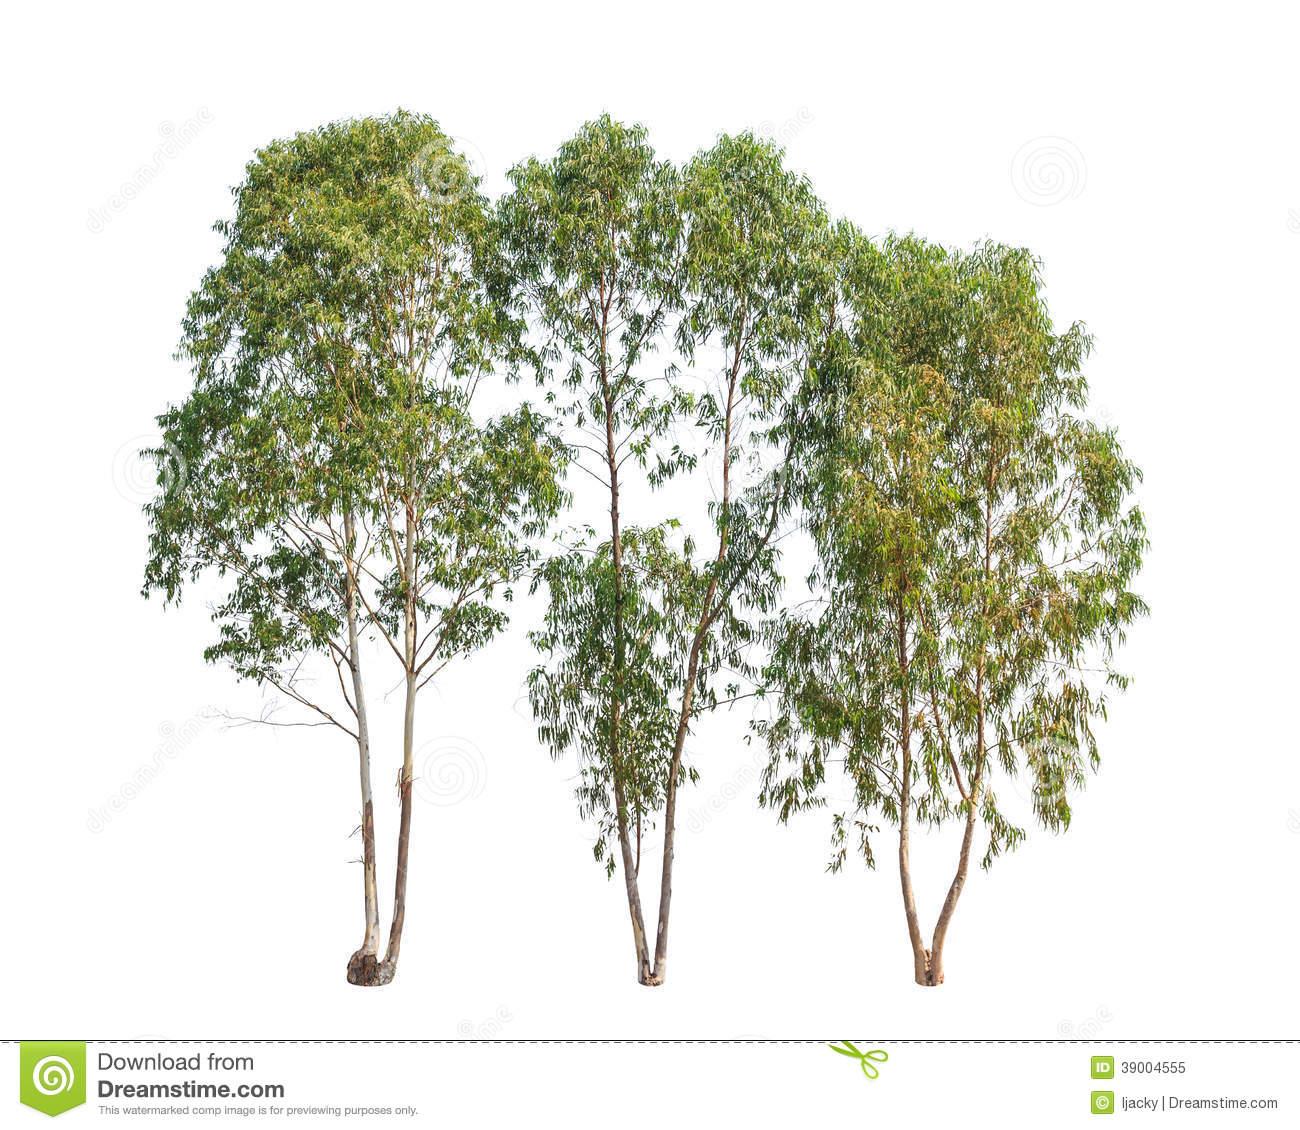 Eucalyptus Gum Tree clipart #5, Download drawings